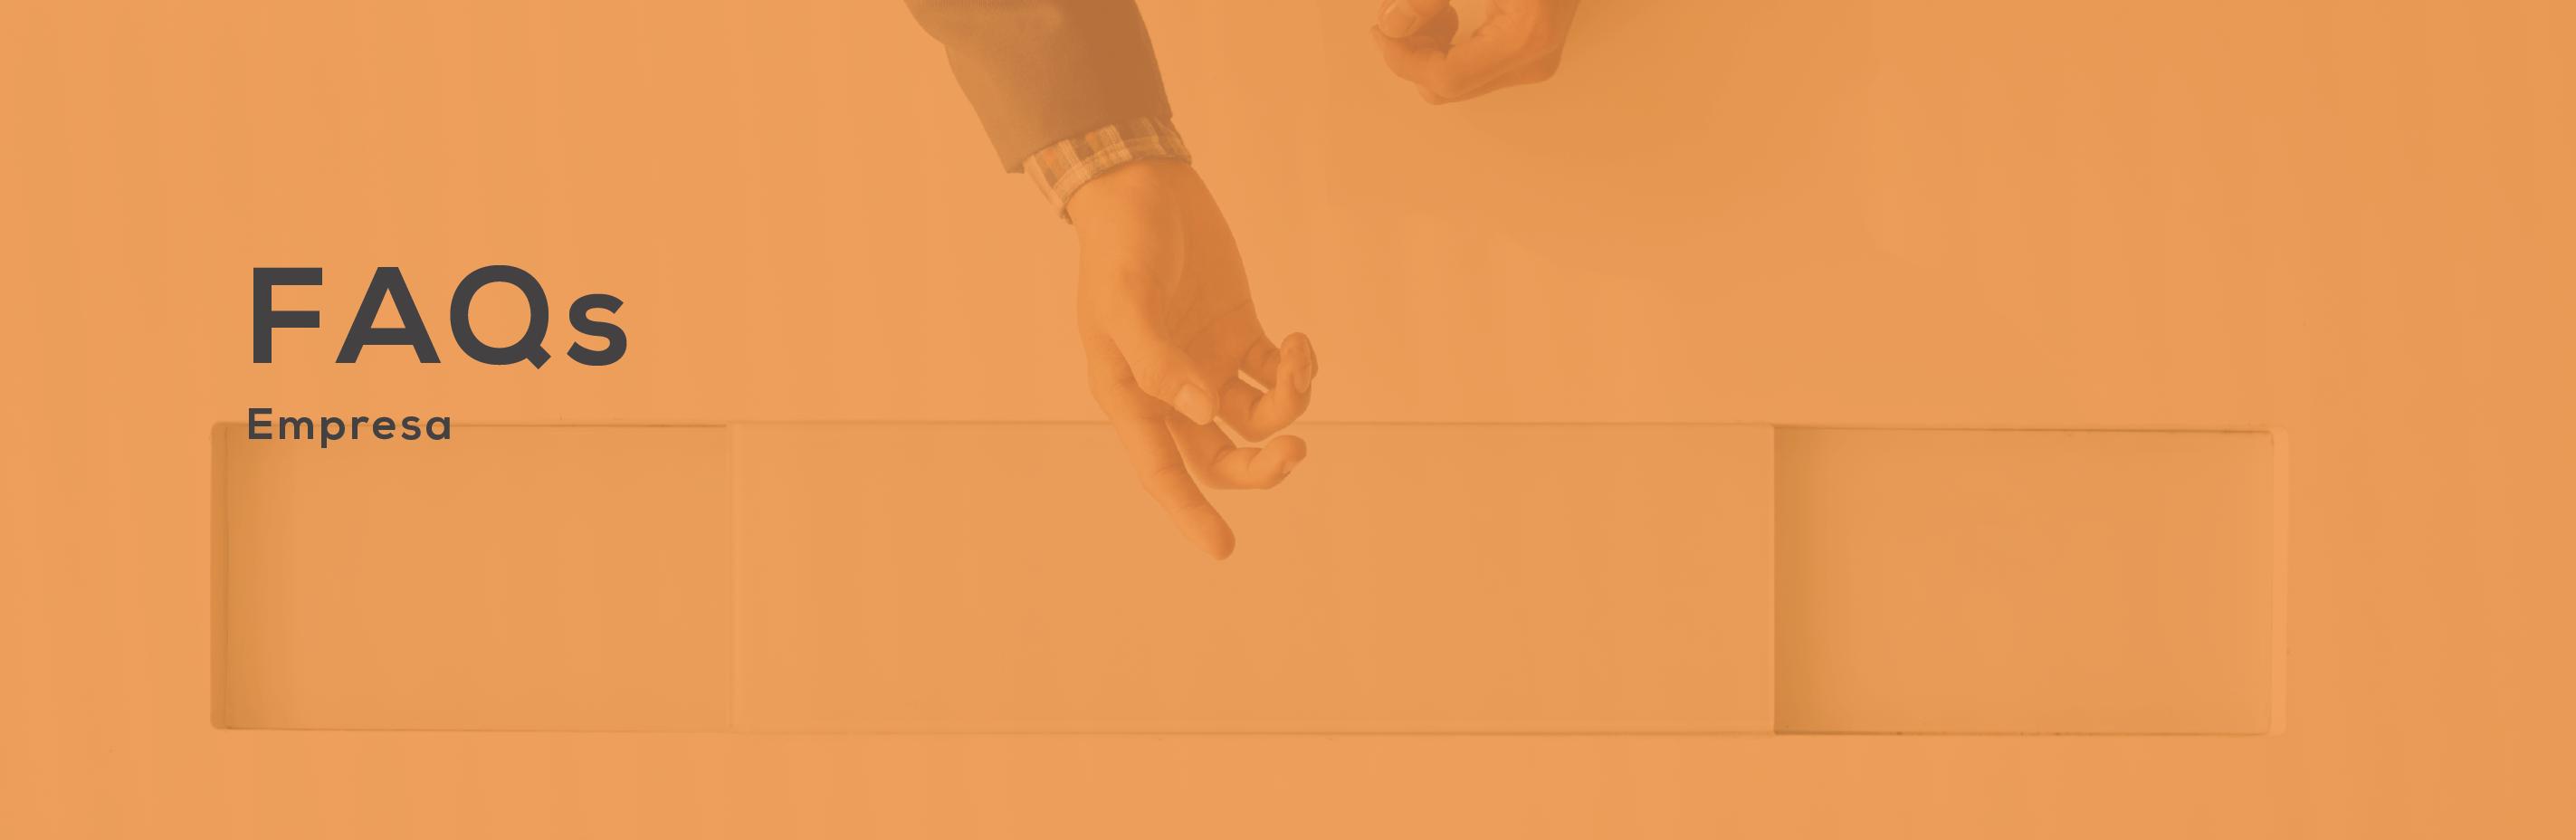 Banners FAQs - Empresas